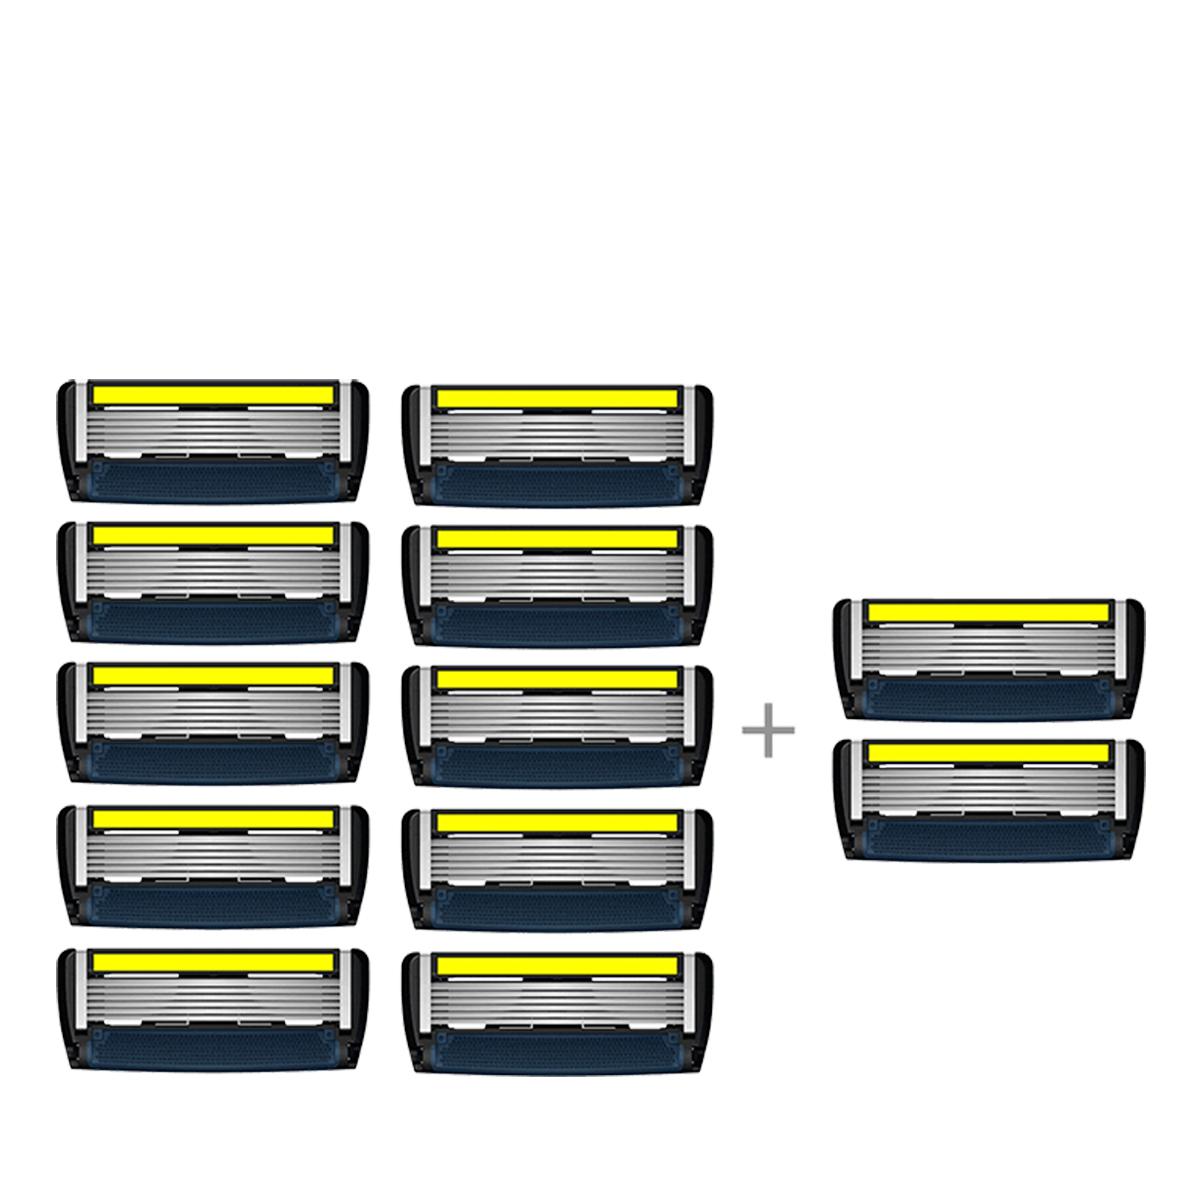 LetsShave | LetsShave Pro 6 Advance Shaving Blades - Pack of 10 + 2 Razor Blades Free